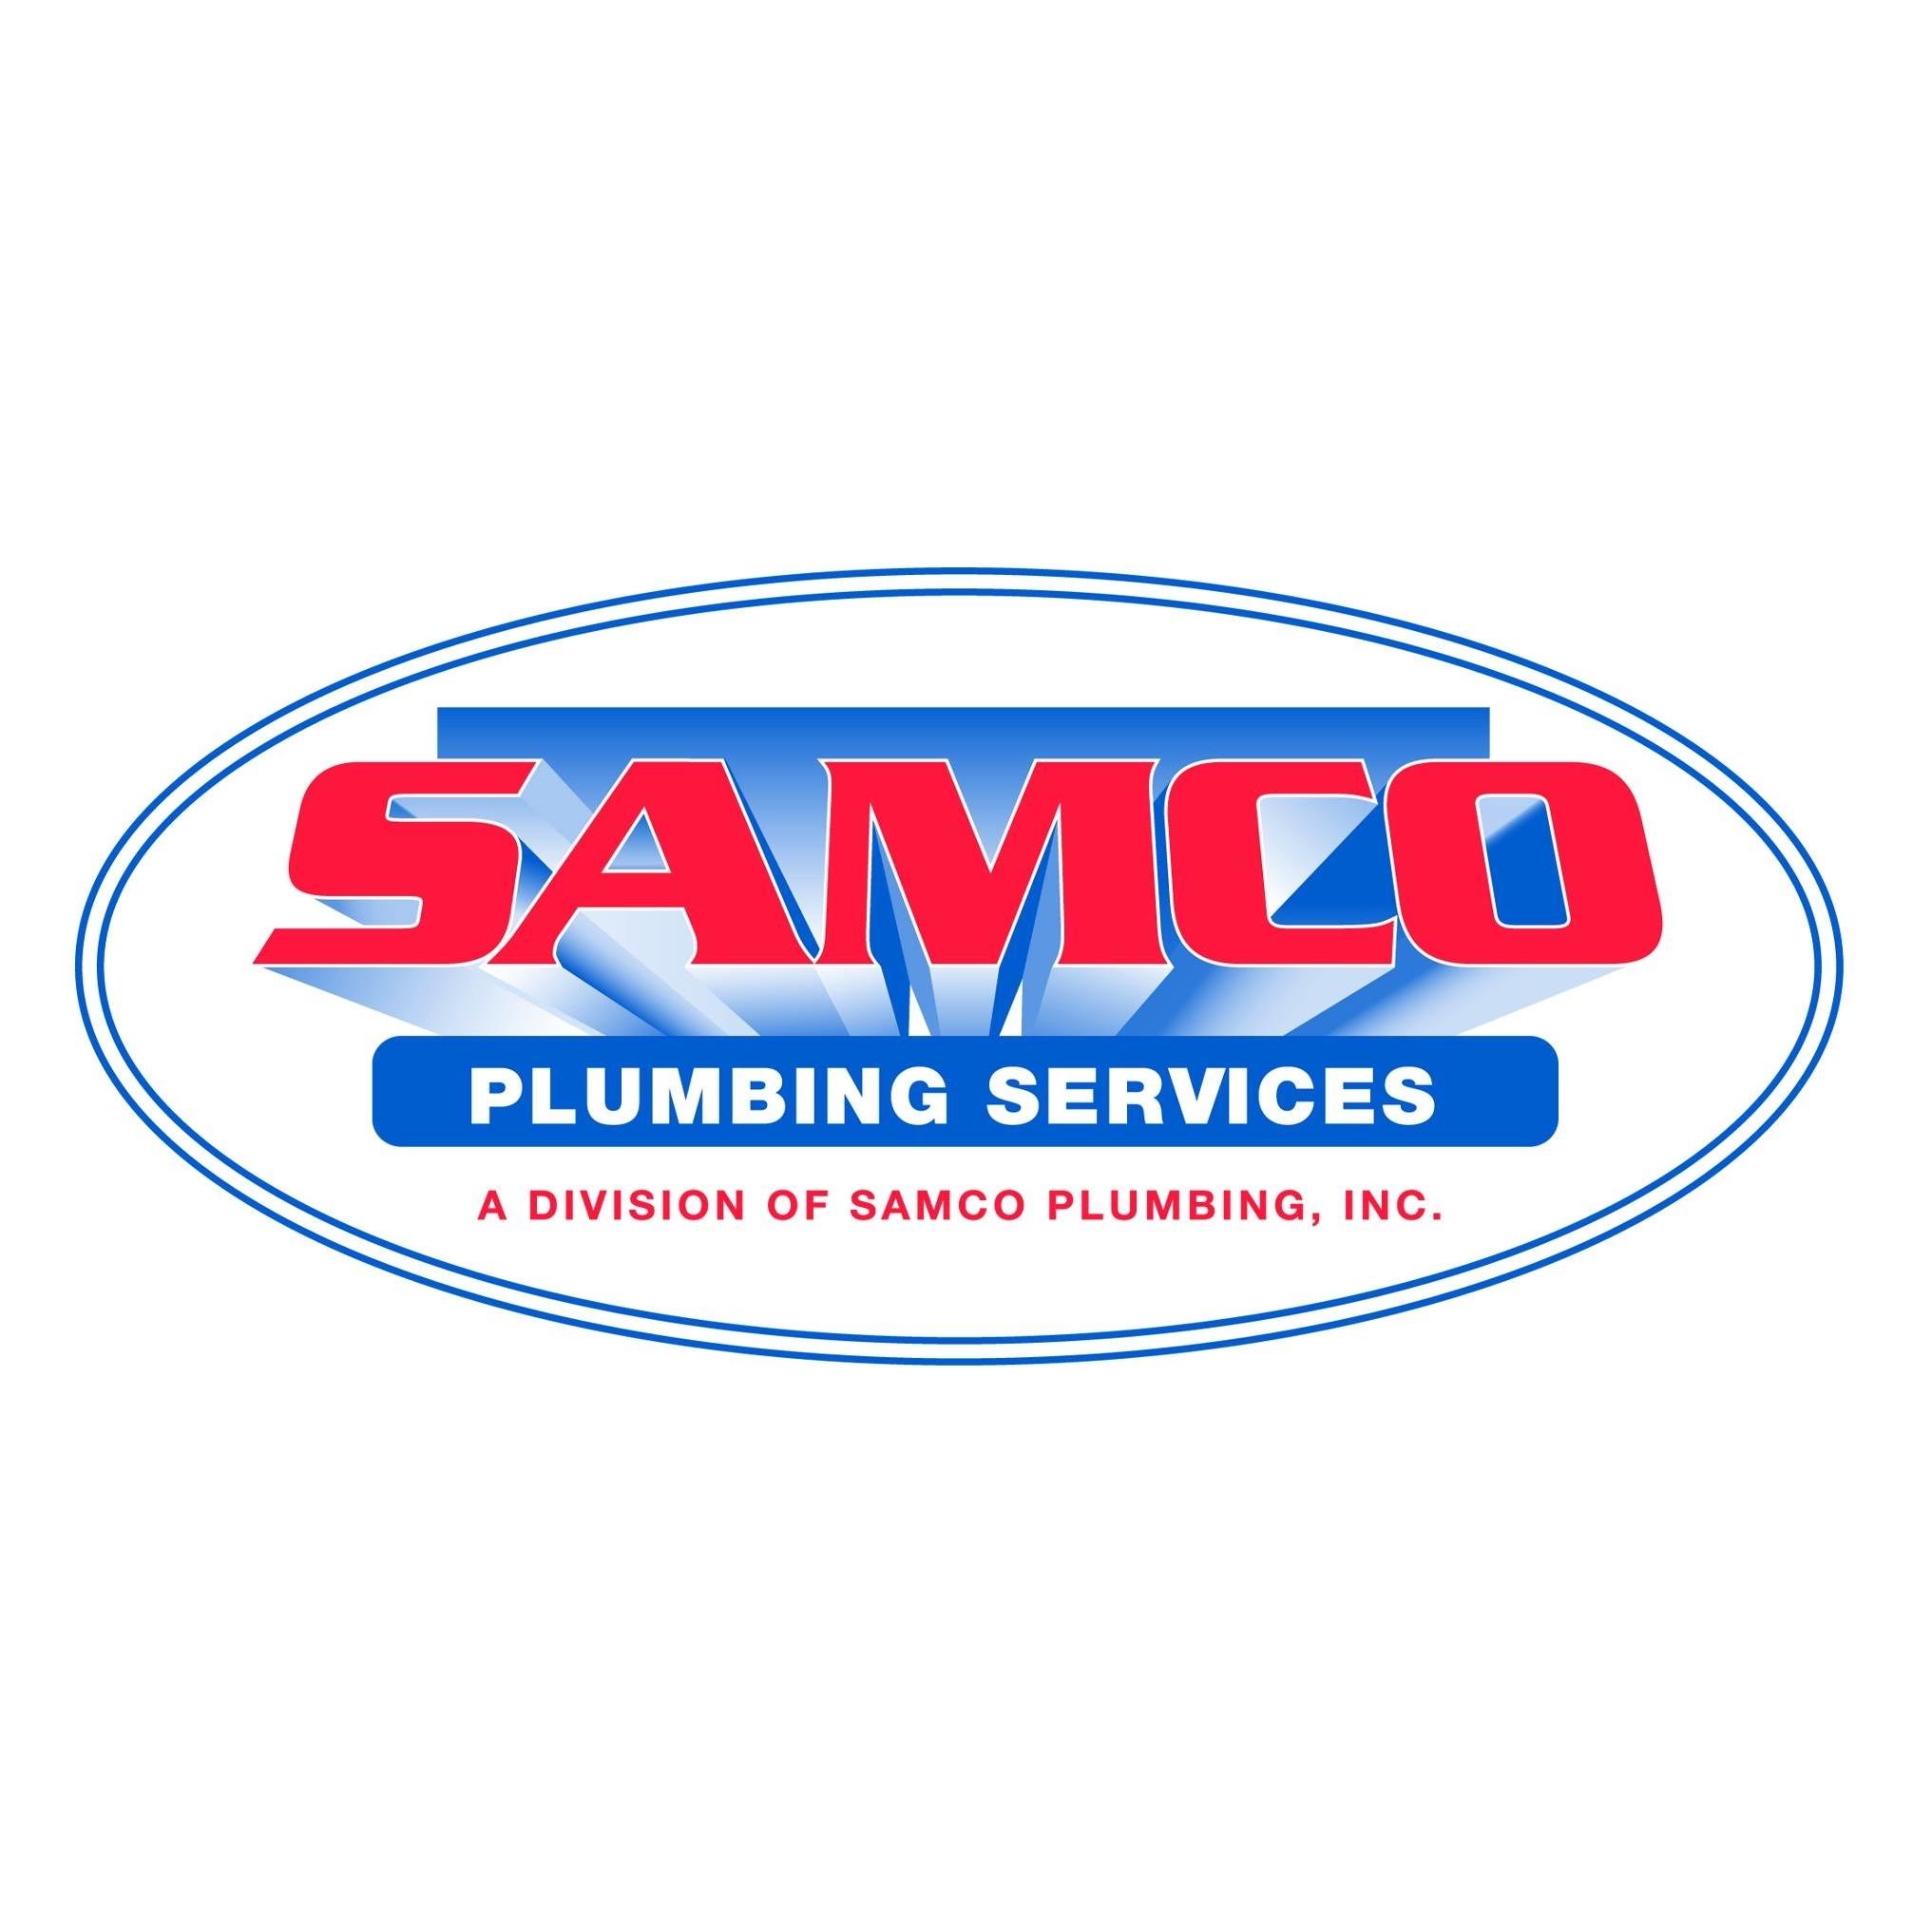 Samco Plumbing Inc image 1